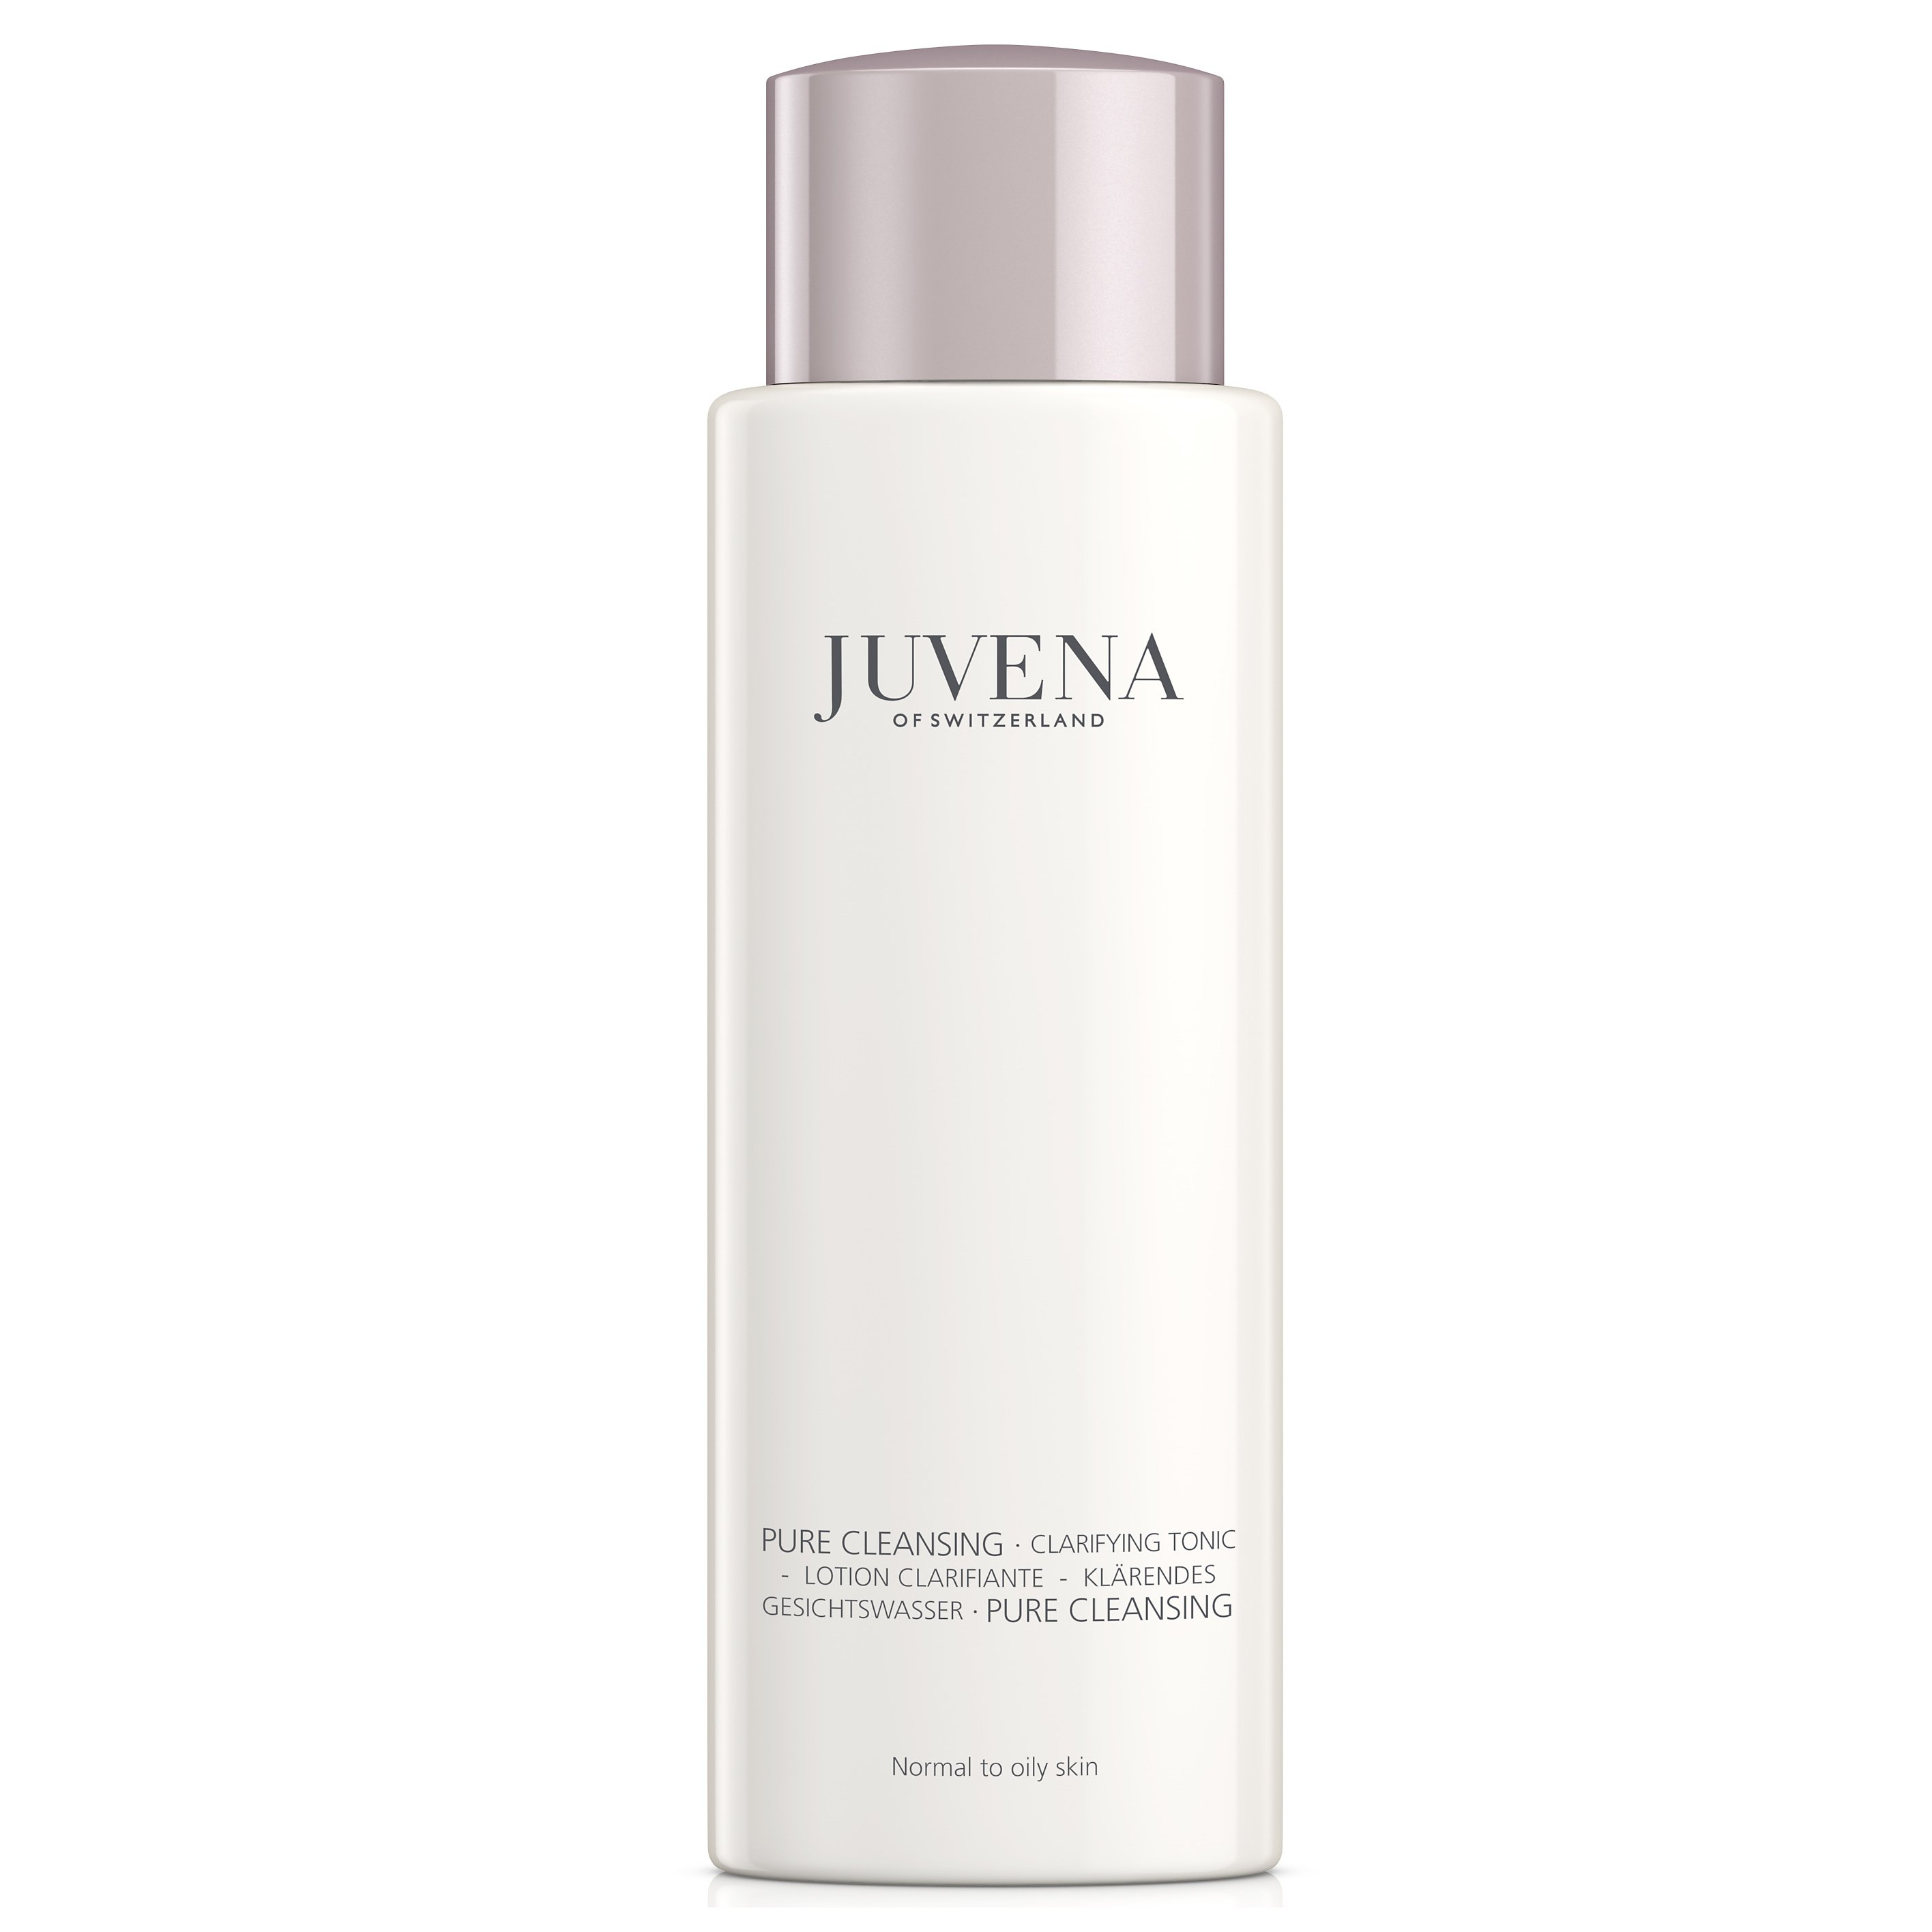 Juvena Pure Cleansing Clarifying Tonic Αναζωογονητική Λοσιόν Προσώπου,Booster Φρεσκάδας & Δροσιάς στις Λιπαρές Επιδερμίδες 200ml